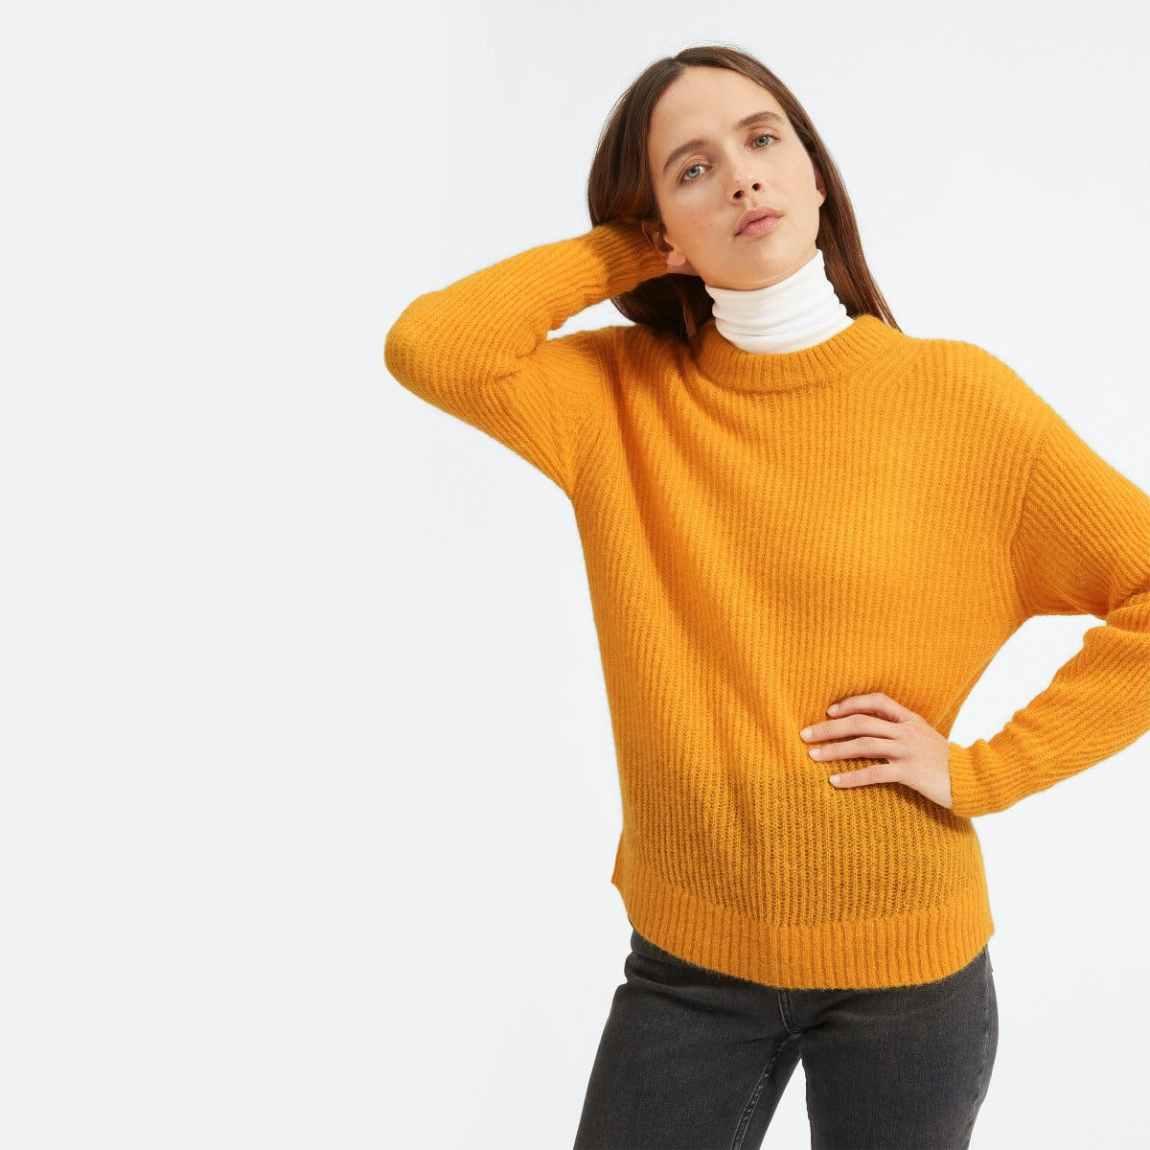 everlane, everlane knit, waffle knit sweater, knit sweater, trutleneck, sweater, orange knit sweater, denimblog, denim blog